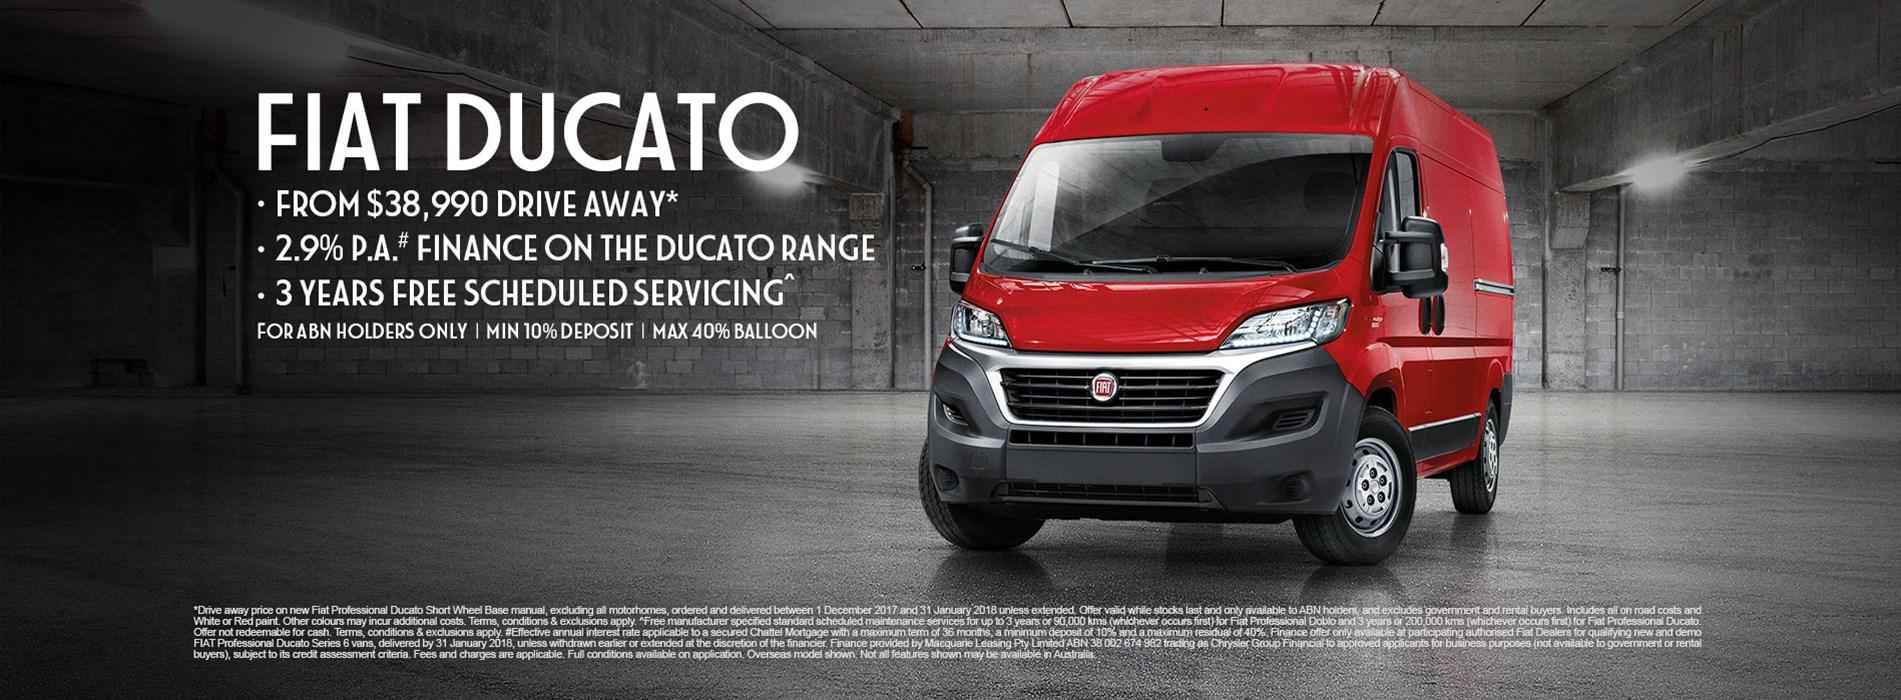 Ducato Homepage Lrg